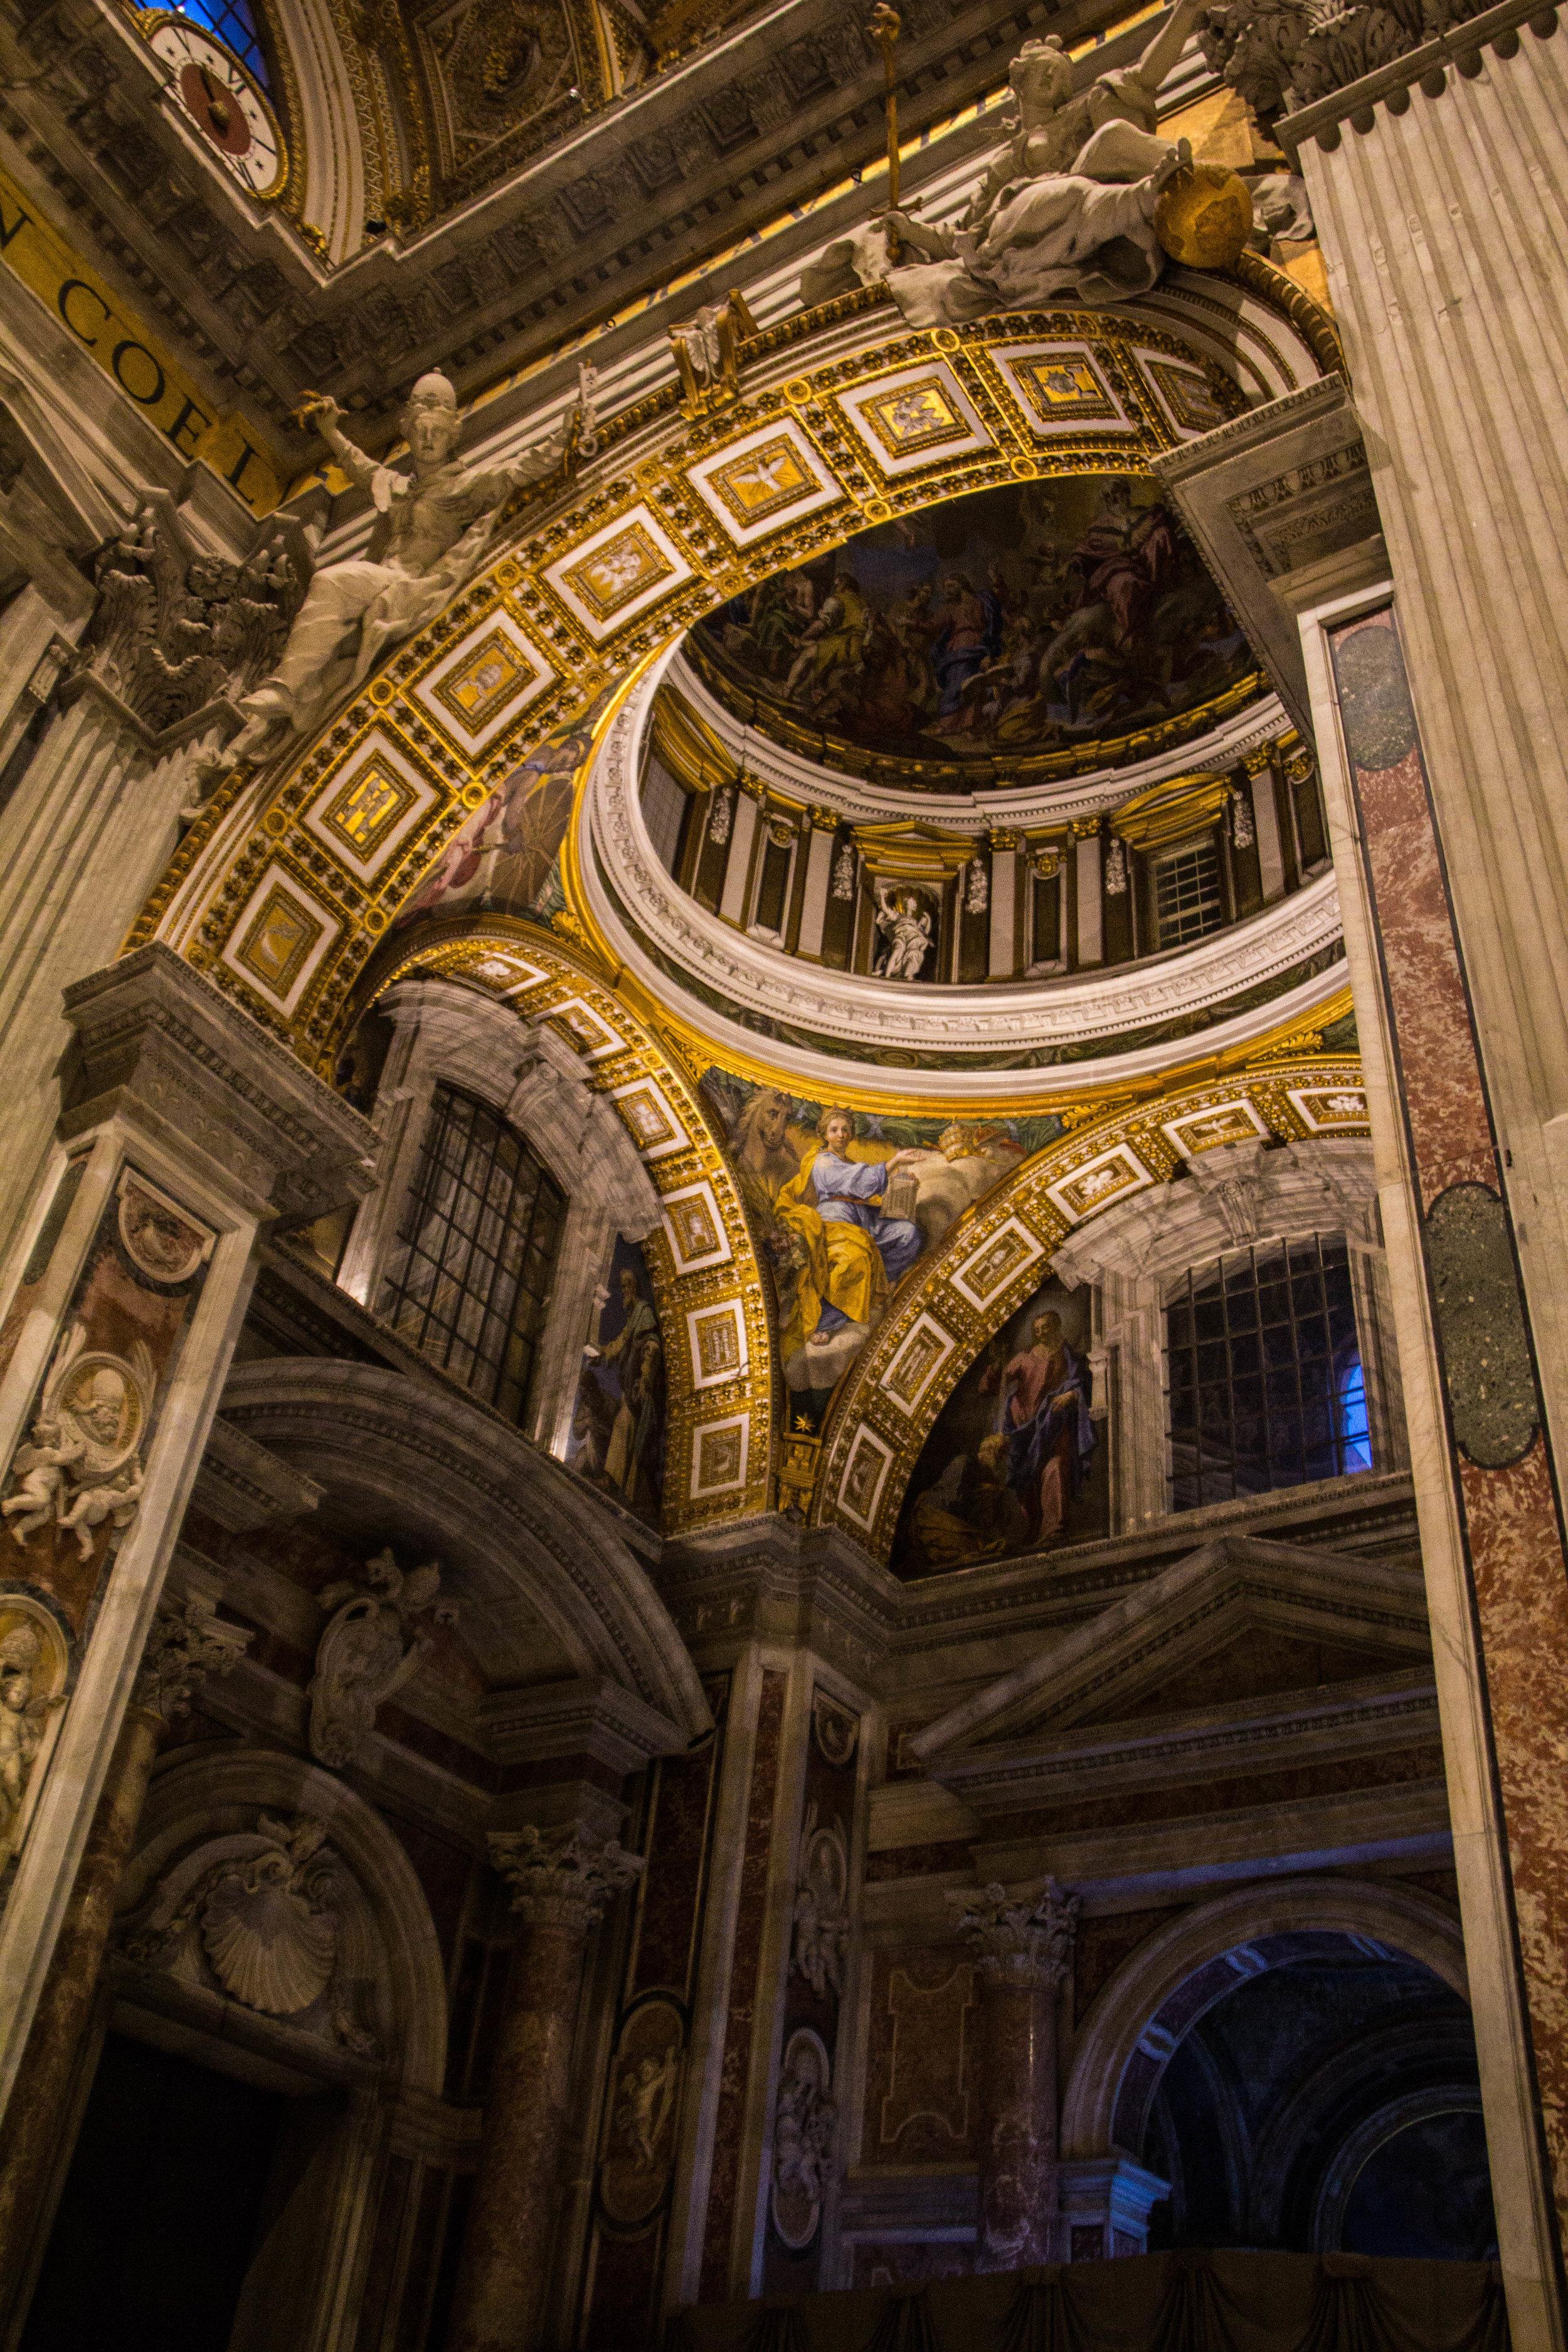 vatican-city-rome-italy-33.jpg